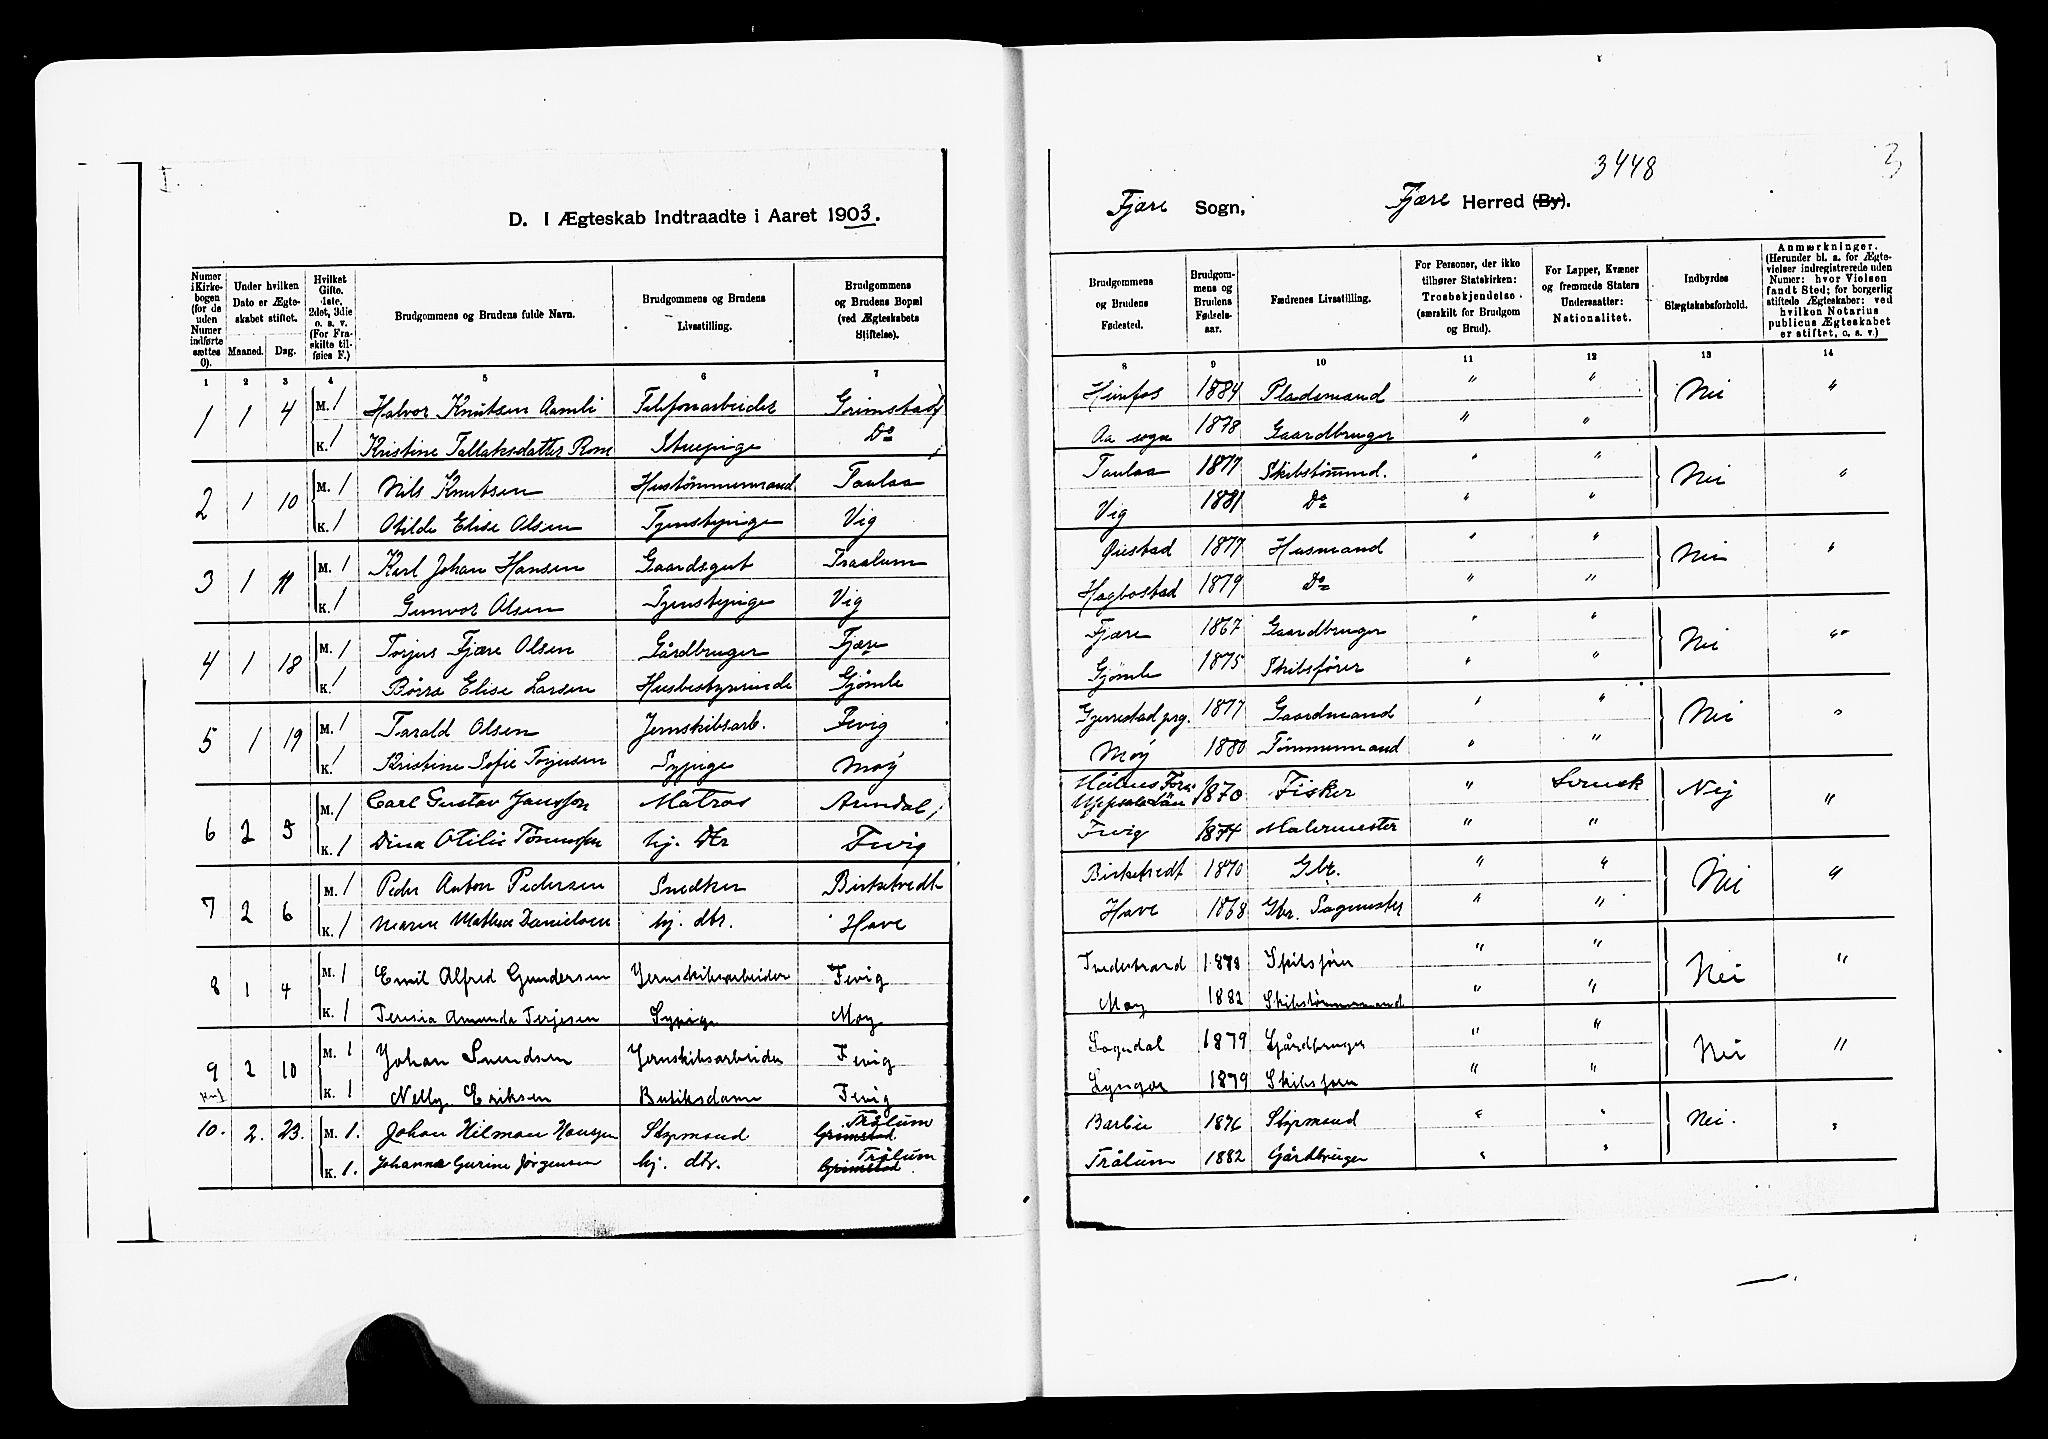 SAK, Fjære sokneprestkontor, F/Fa/L0003: Ministerialbok nr. A 3.1, 1903-1920, s. 1